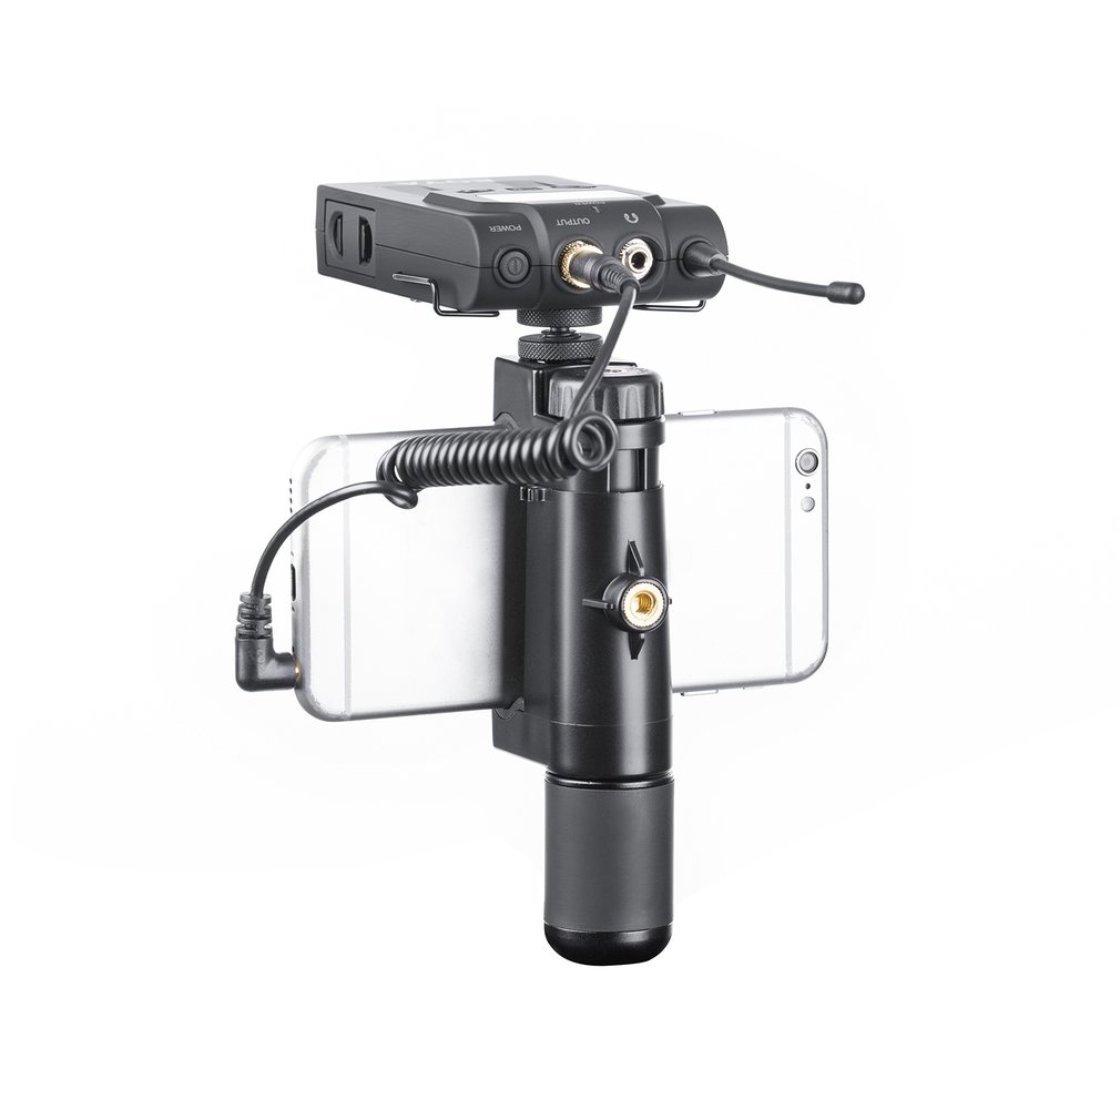 BOYA 手持ちスタビライザー スマートグリップ カメラ用 スマートフォン ビデオ録画用   B07JHNRBSV